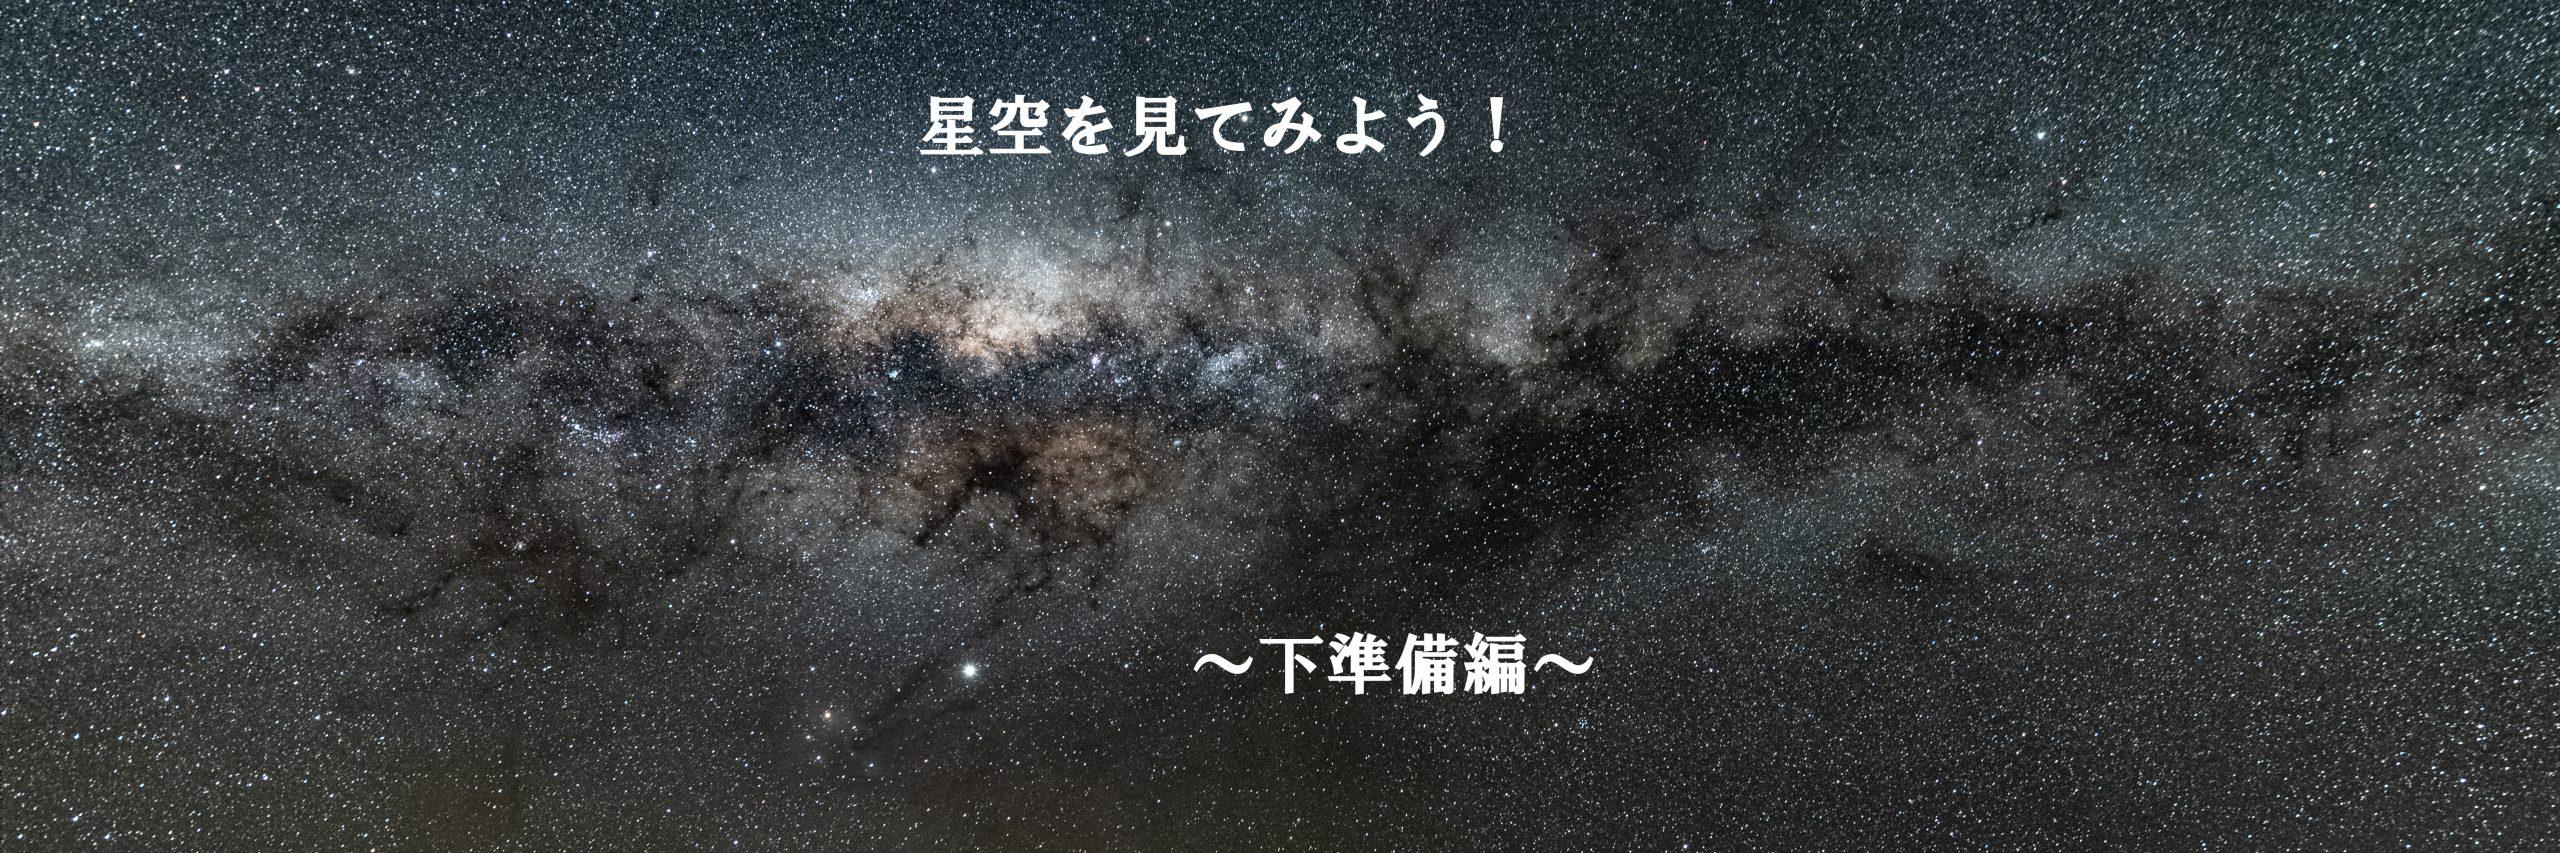 【Wish Upon a Star】星空を見てみよう!!~下準備編~